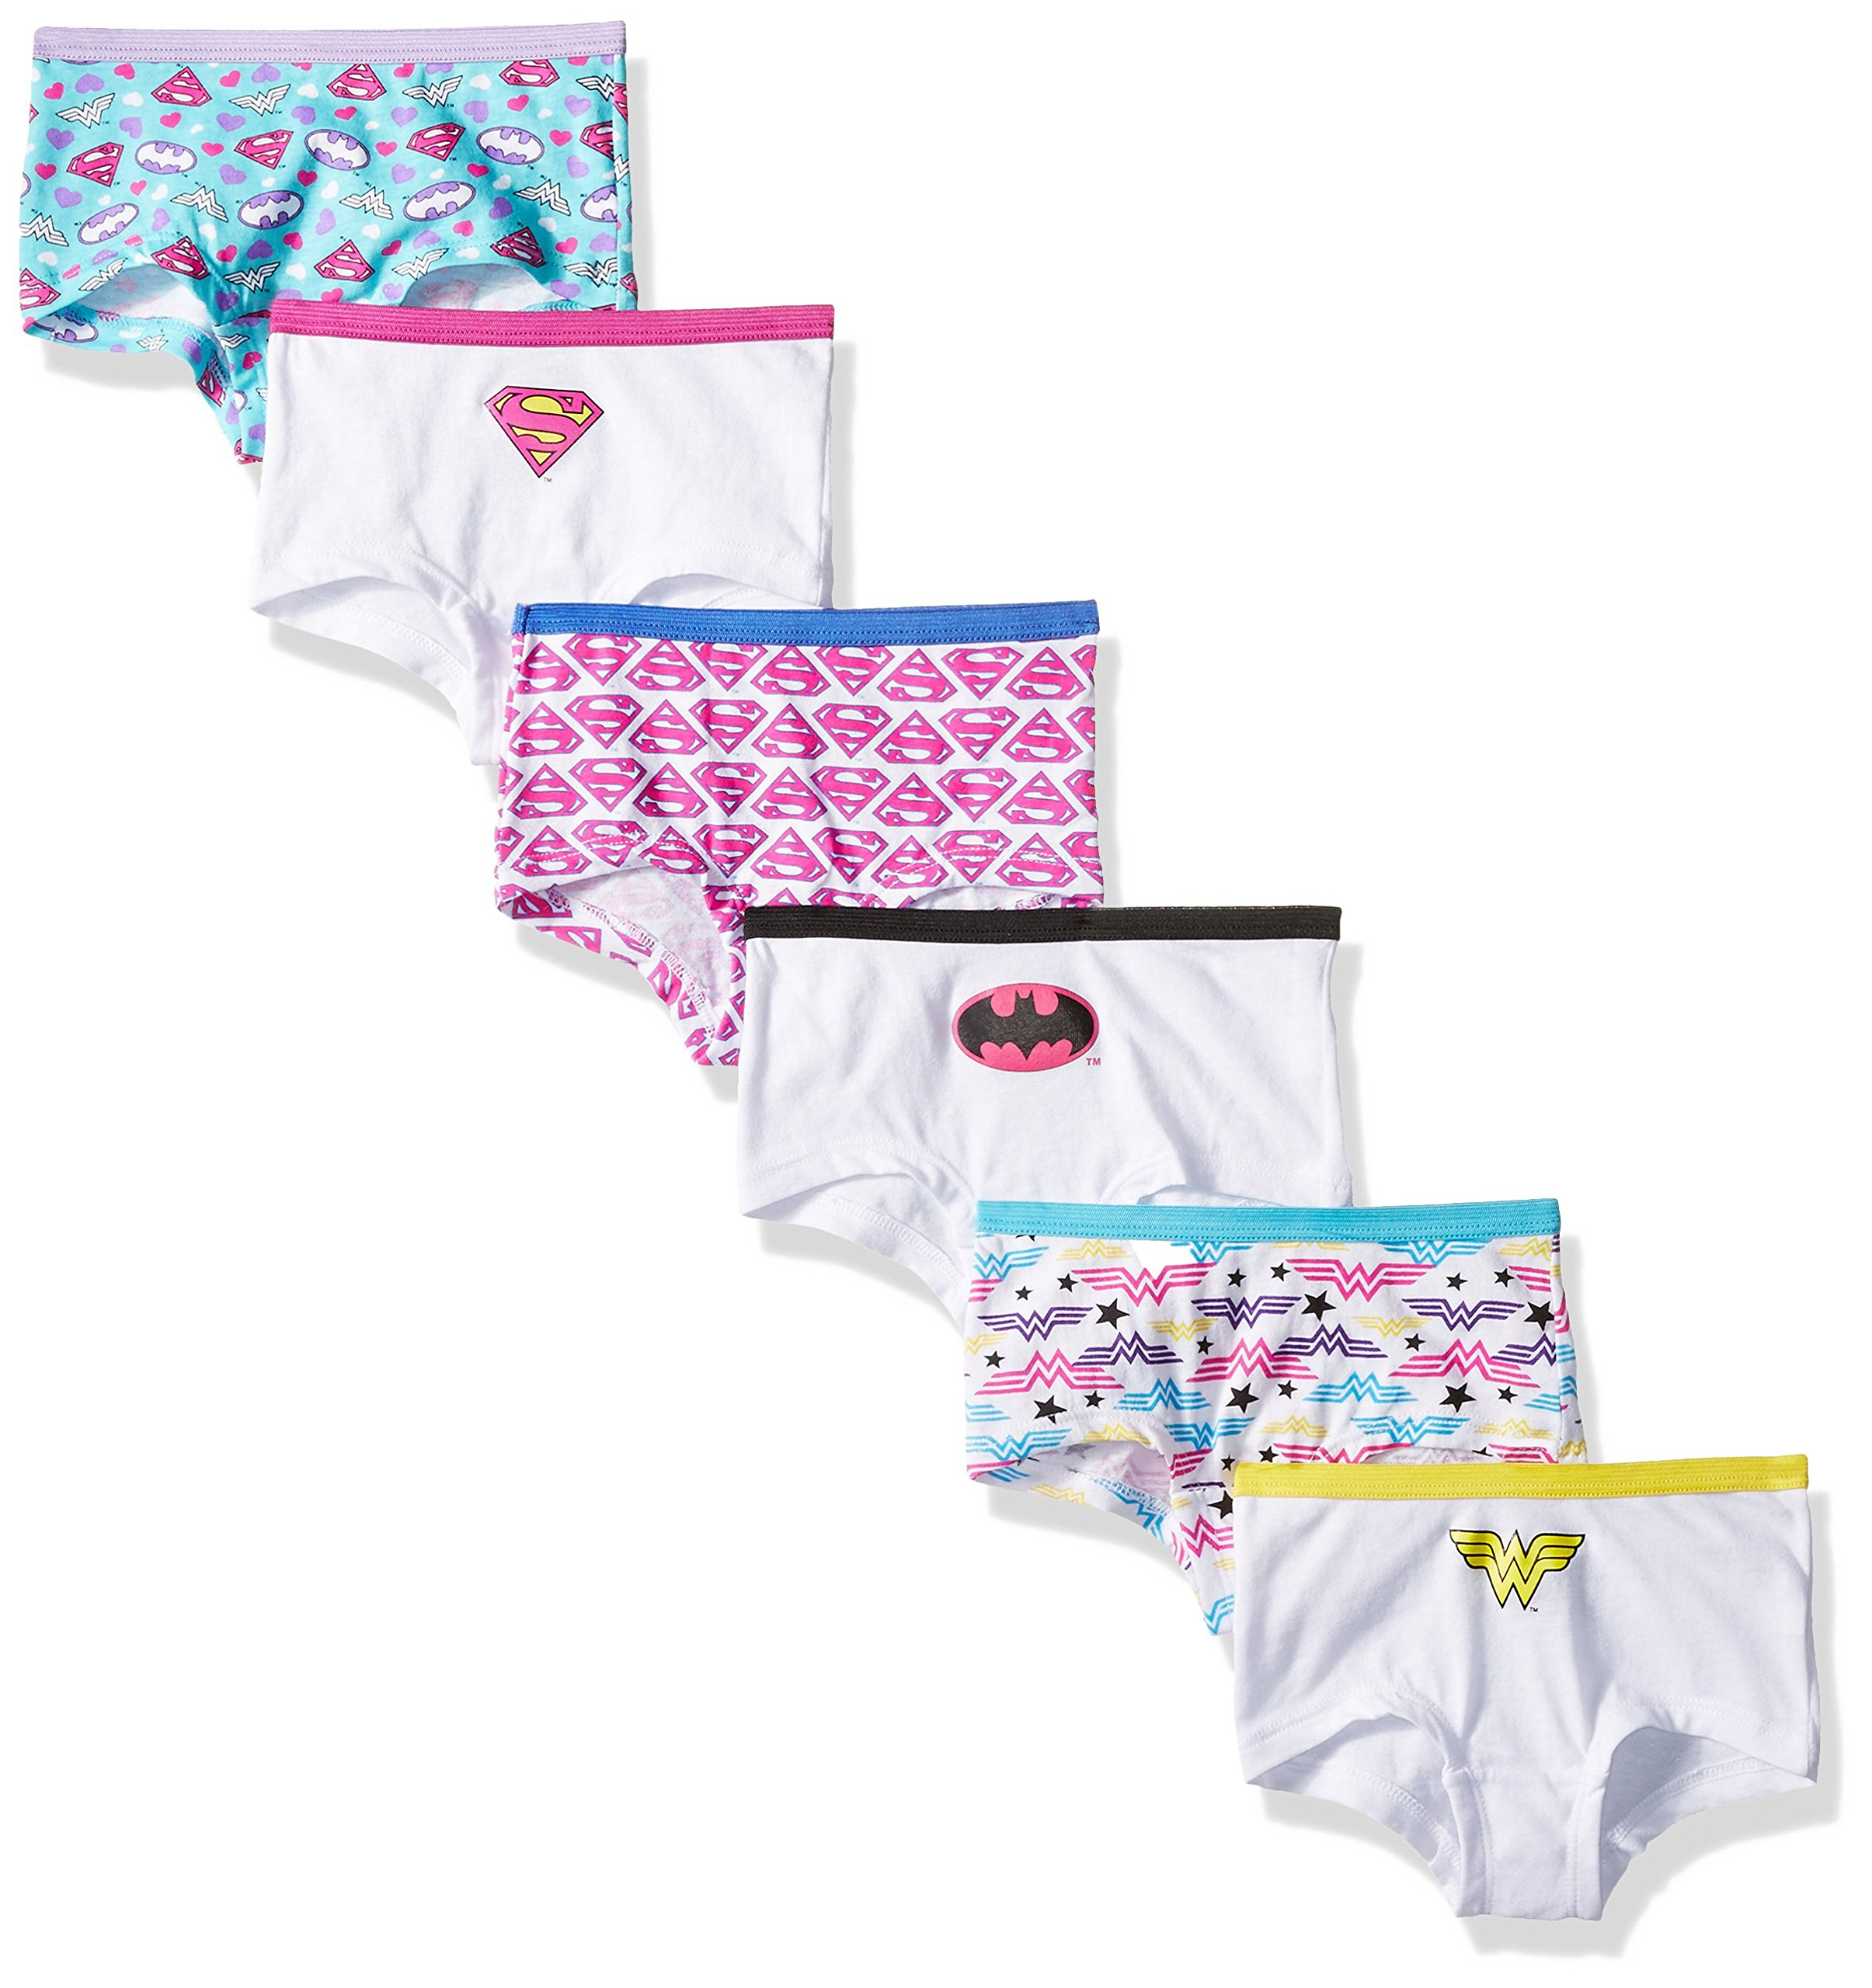 DC Comics Girls' Justice League Logo 6pk Girlshorts Panty